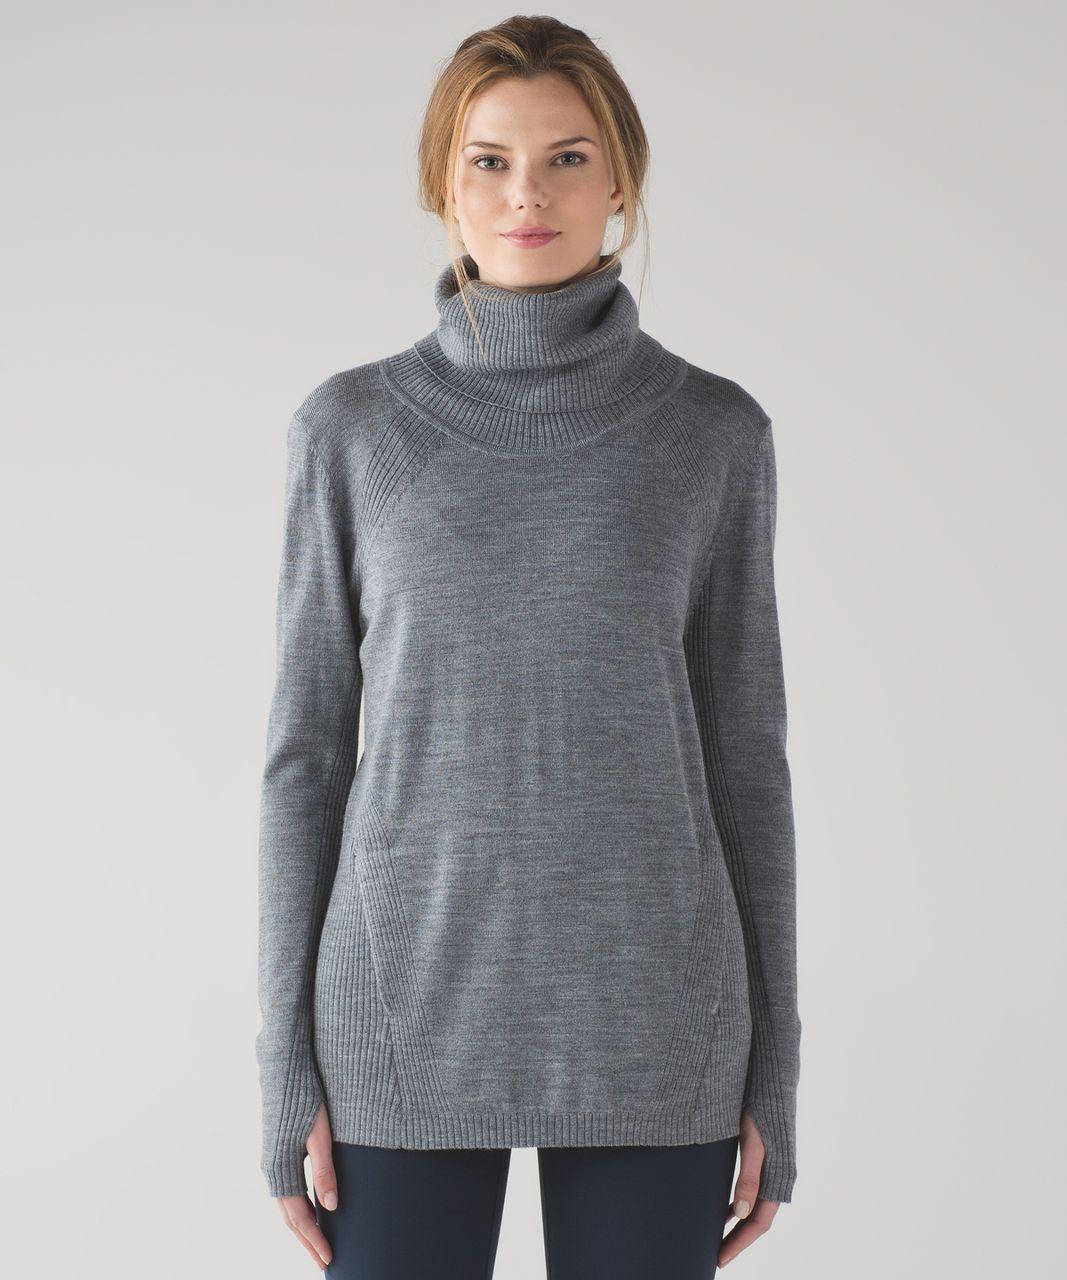 Lululemon Sweat And Savasana Sweater Heathered Medium Grey